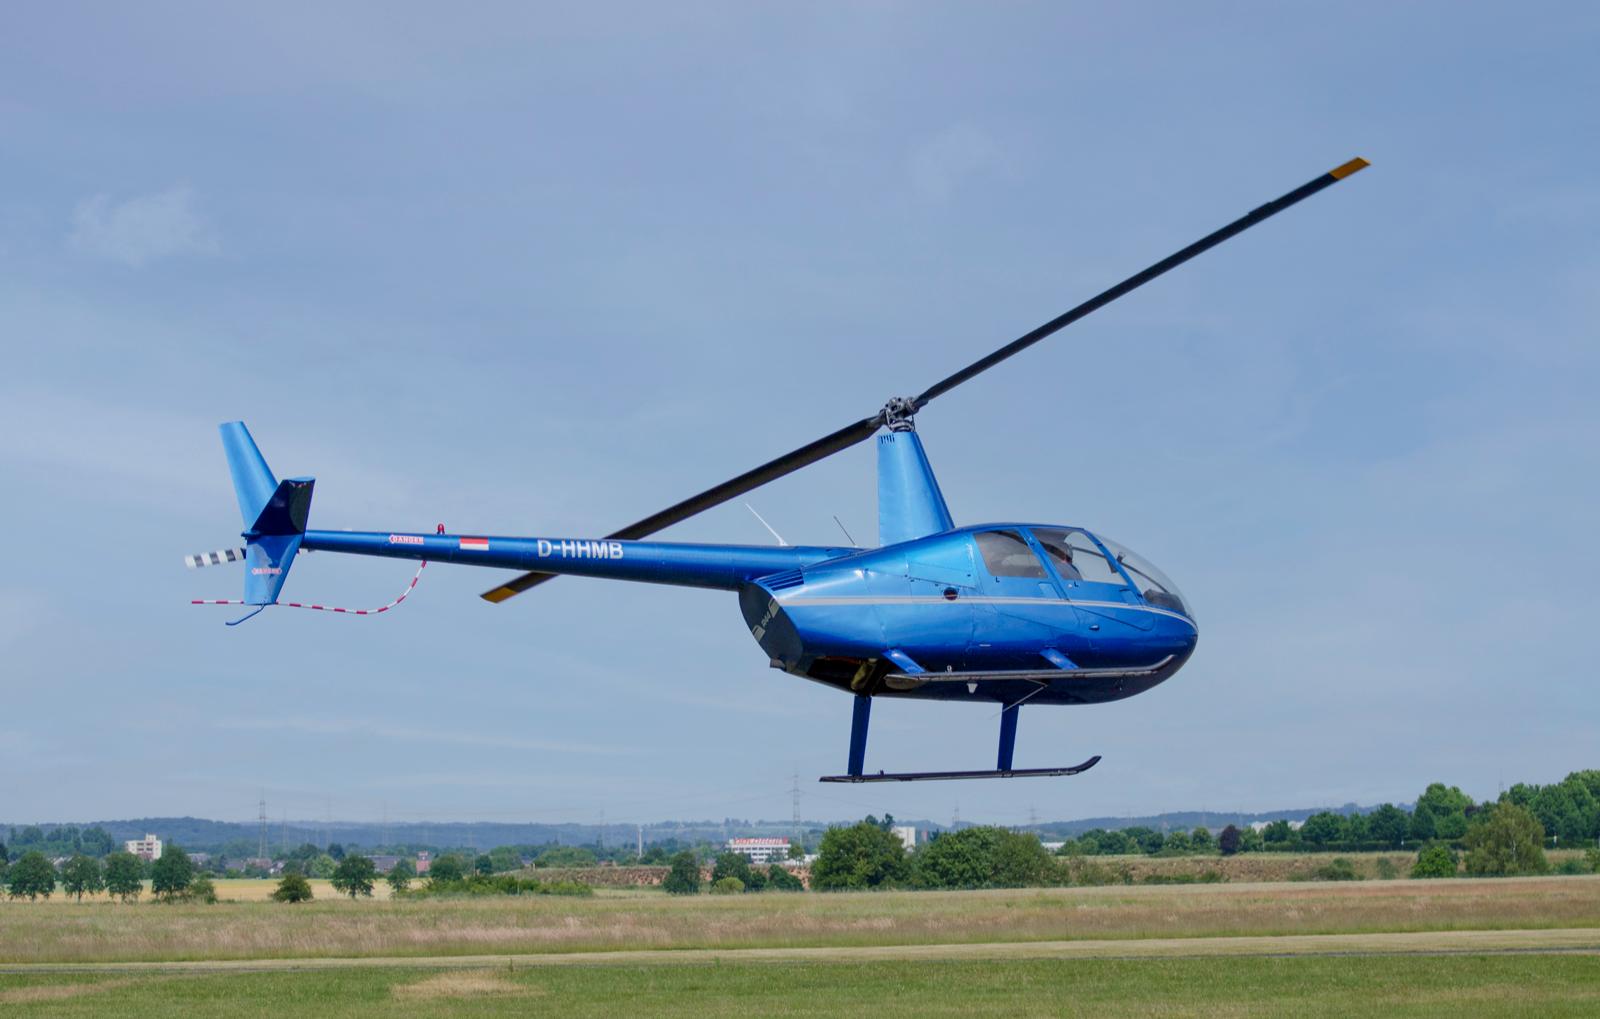 hubschrauber-fliegen-grosspoesna-bg1